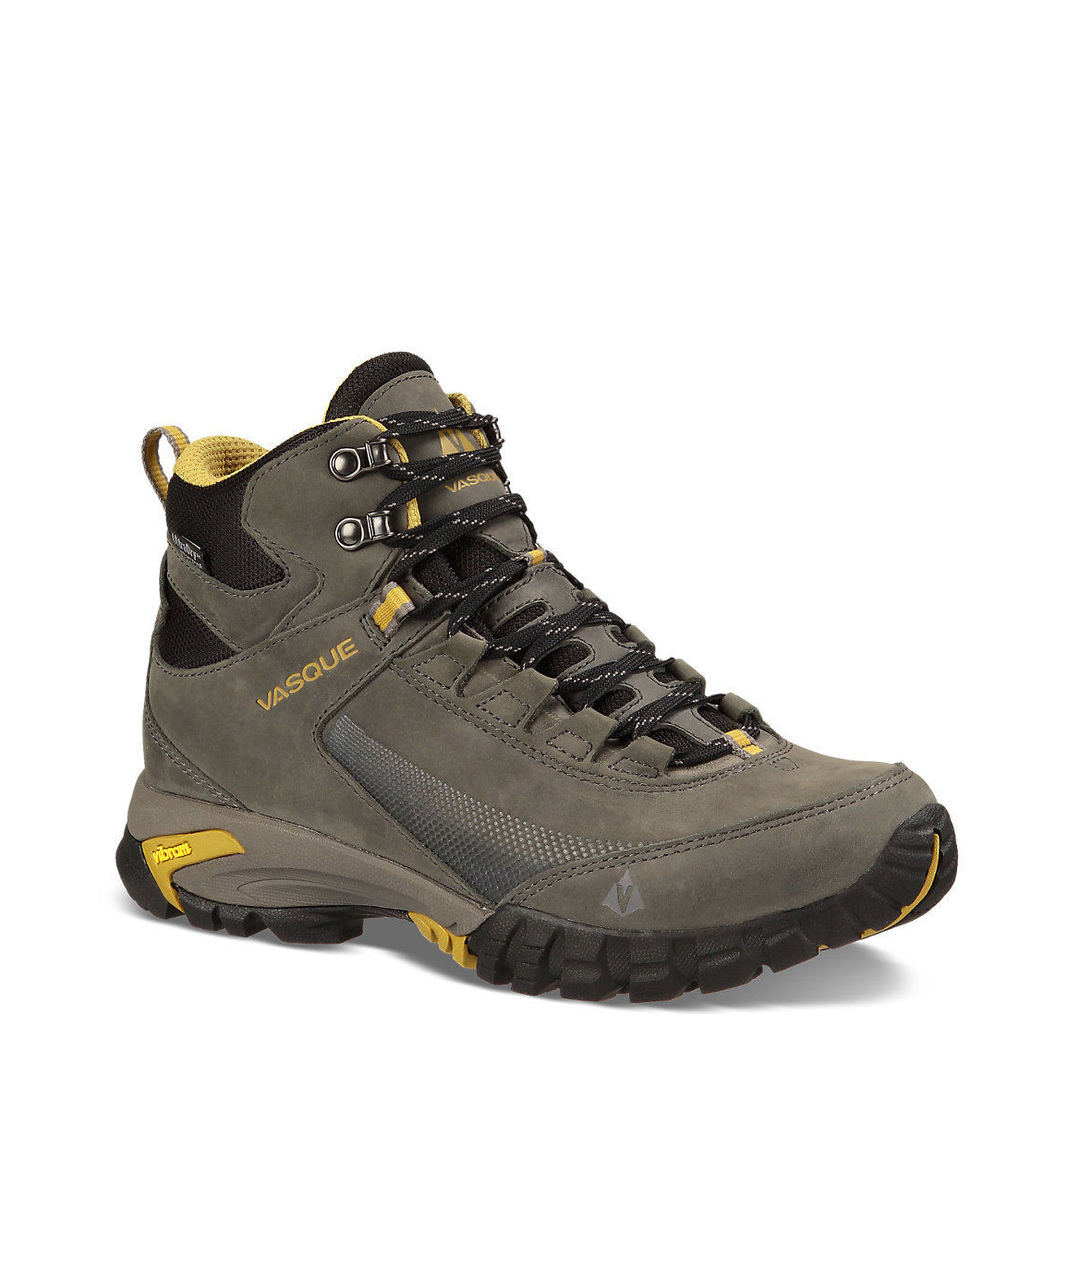 Vasque Talus Trek UltraDry Hiking Boots